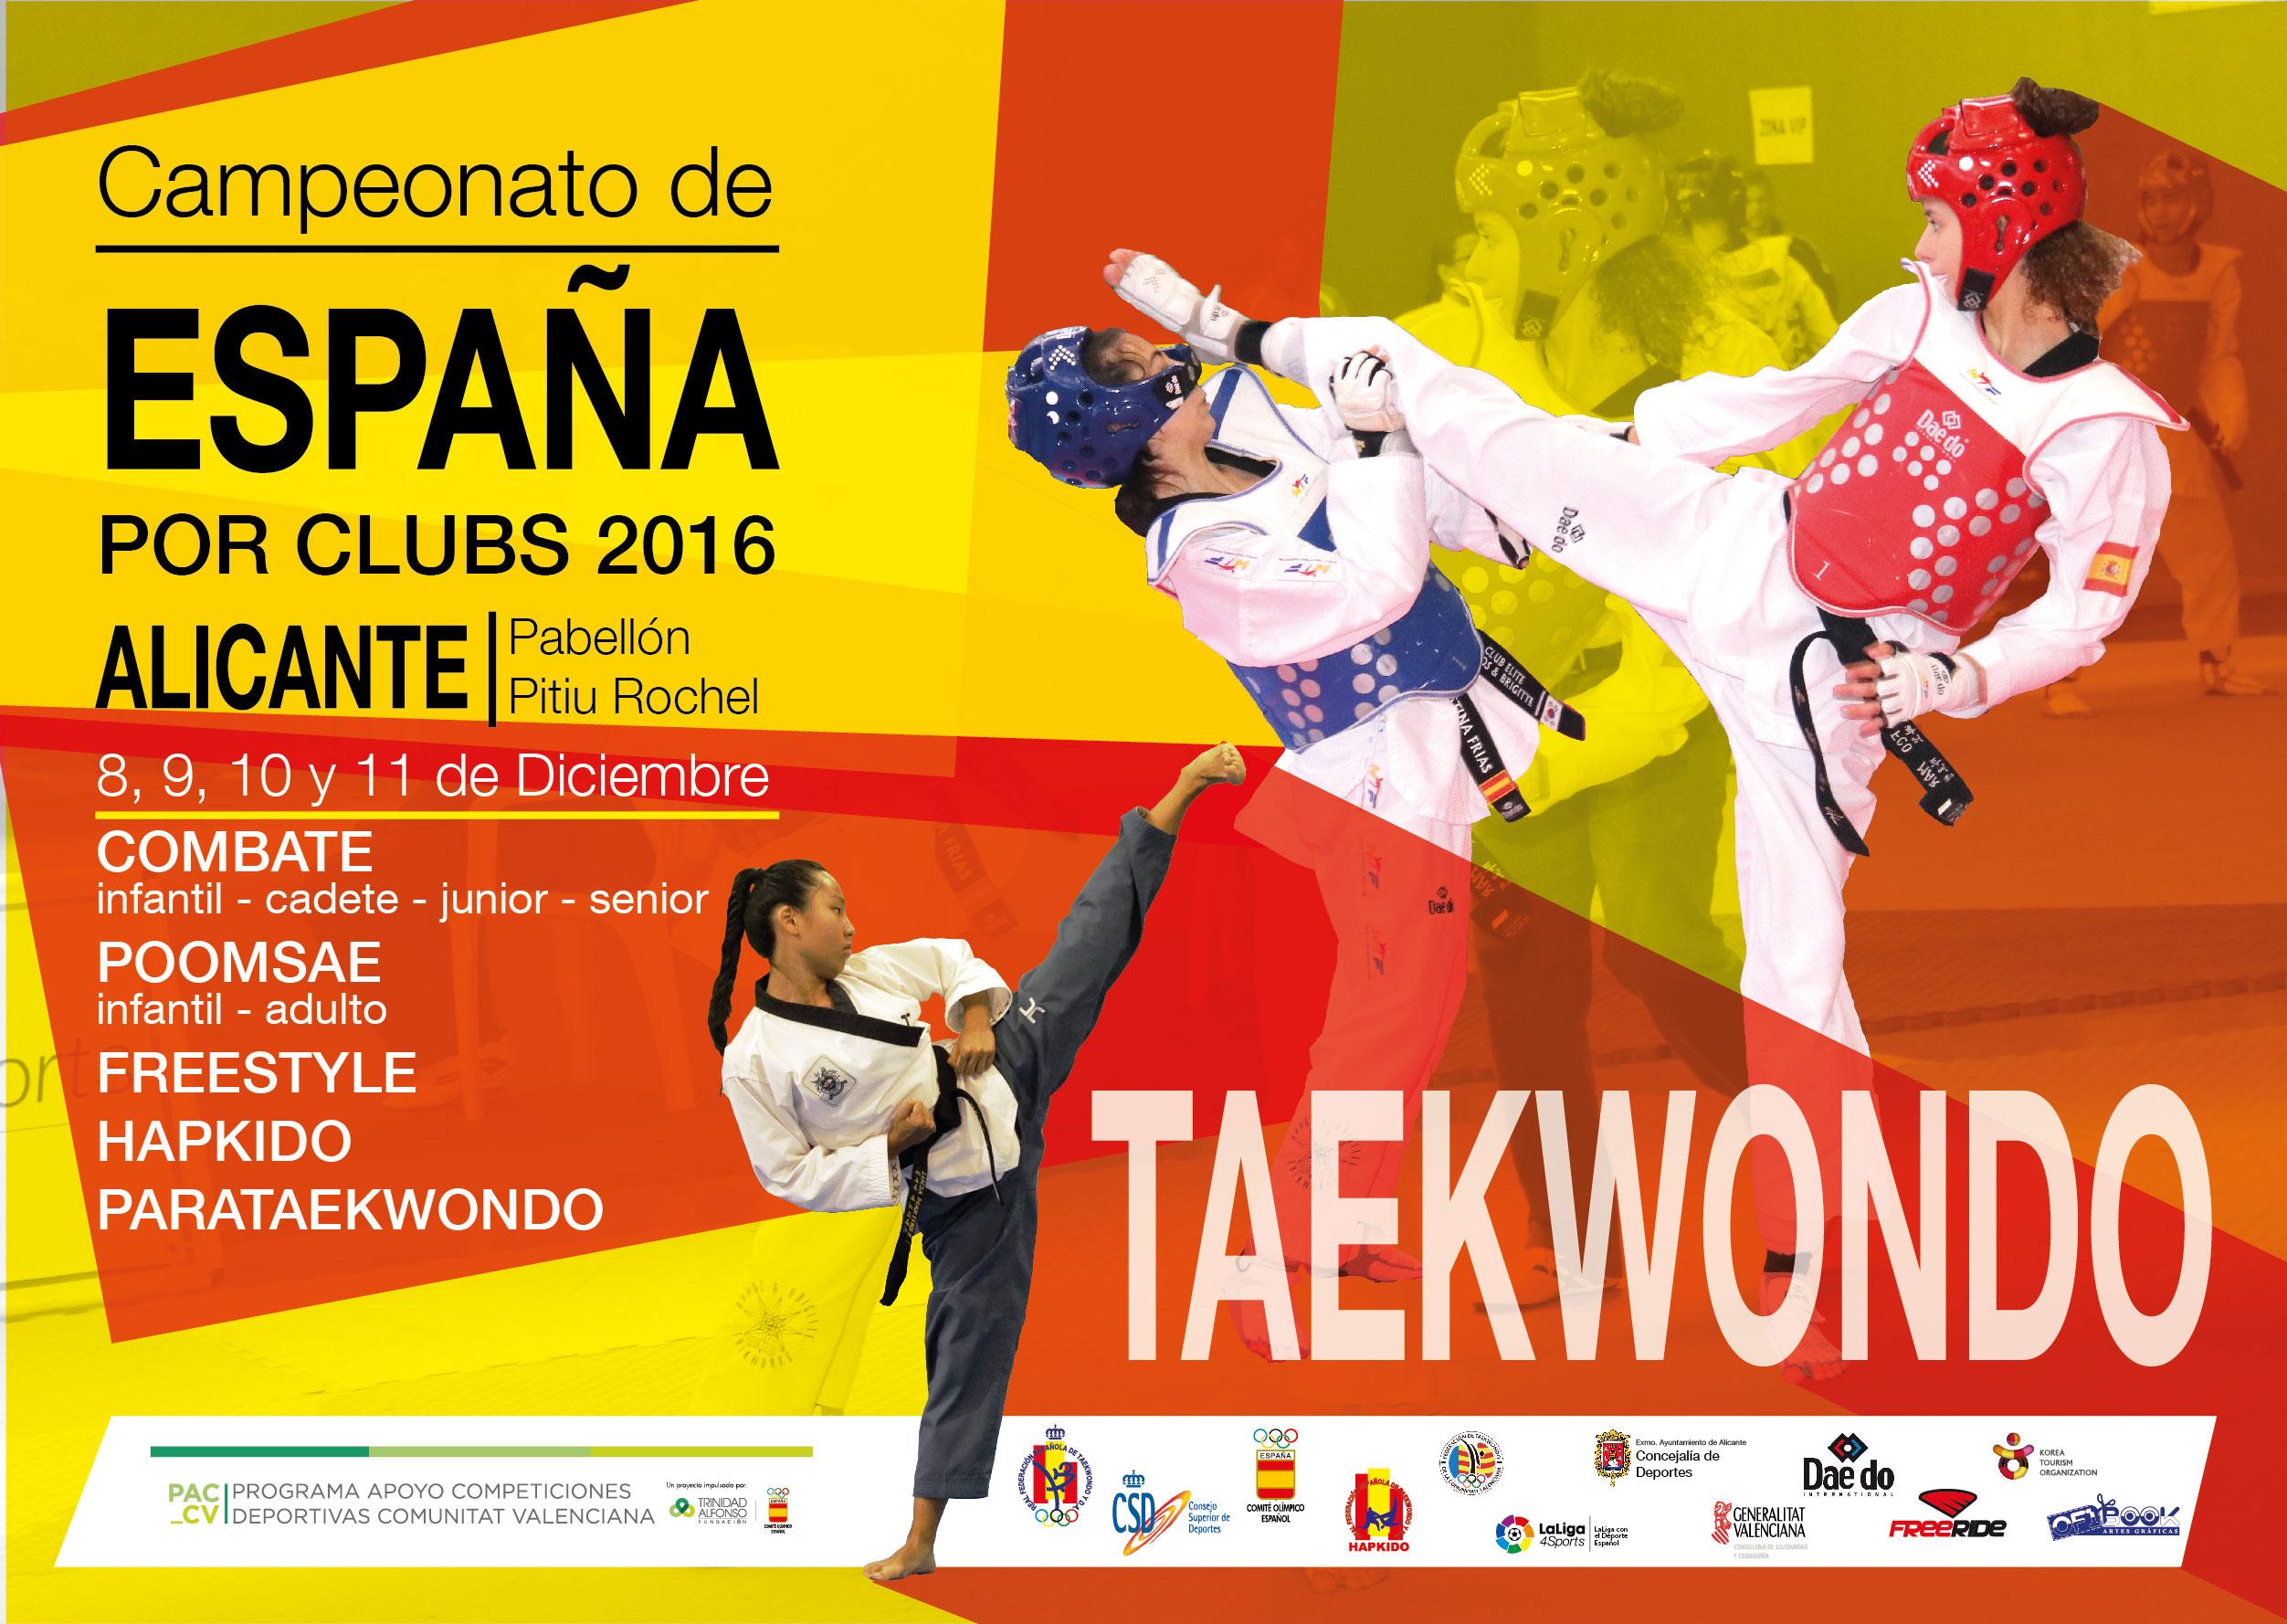 cartel-campeonato-espana-clubes-diciembre-2016-alta-01-02